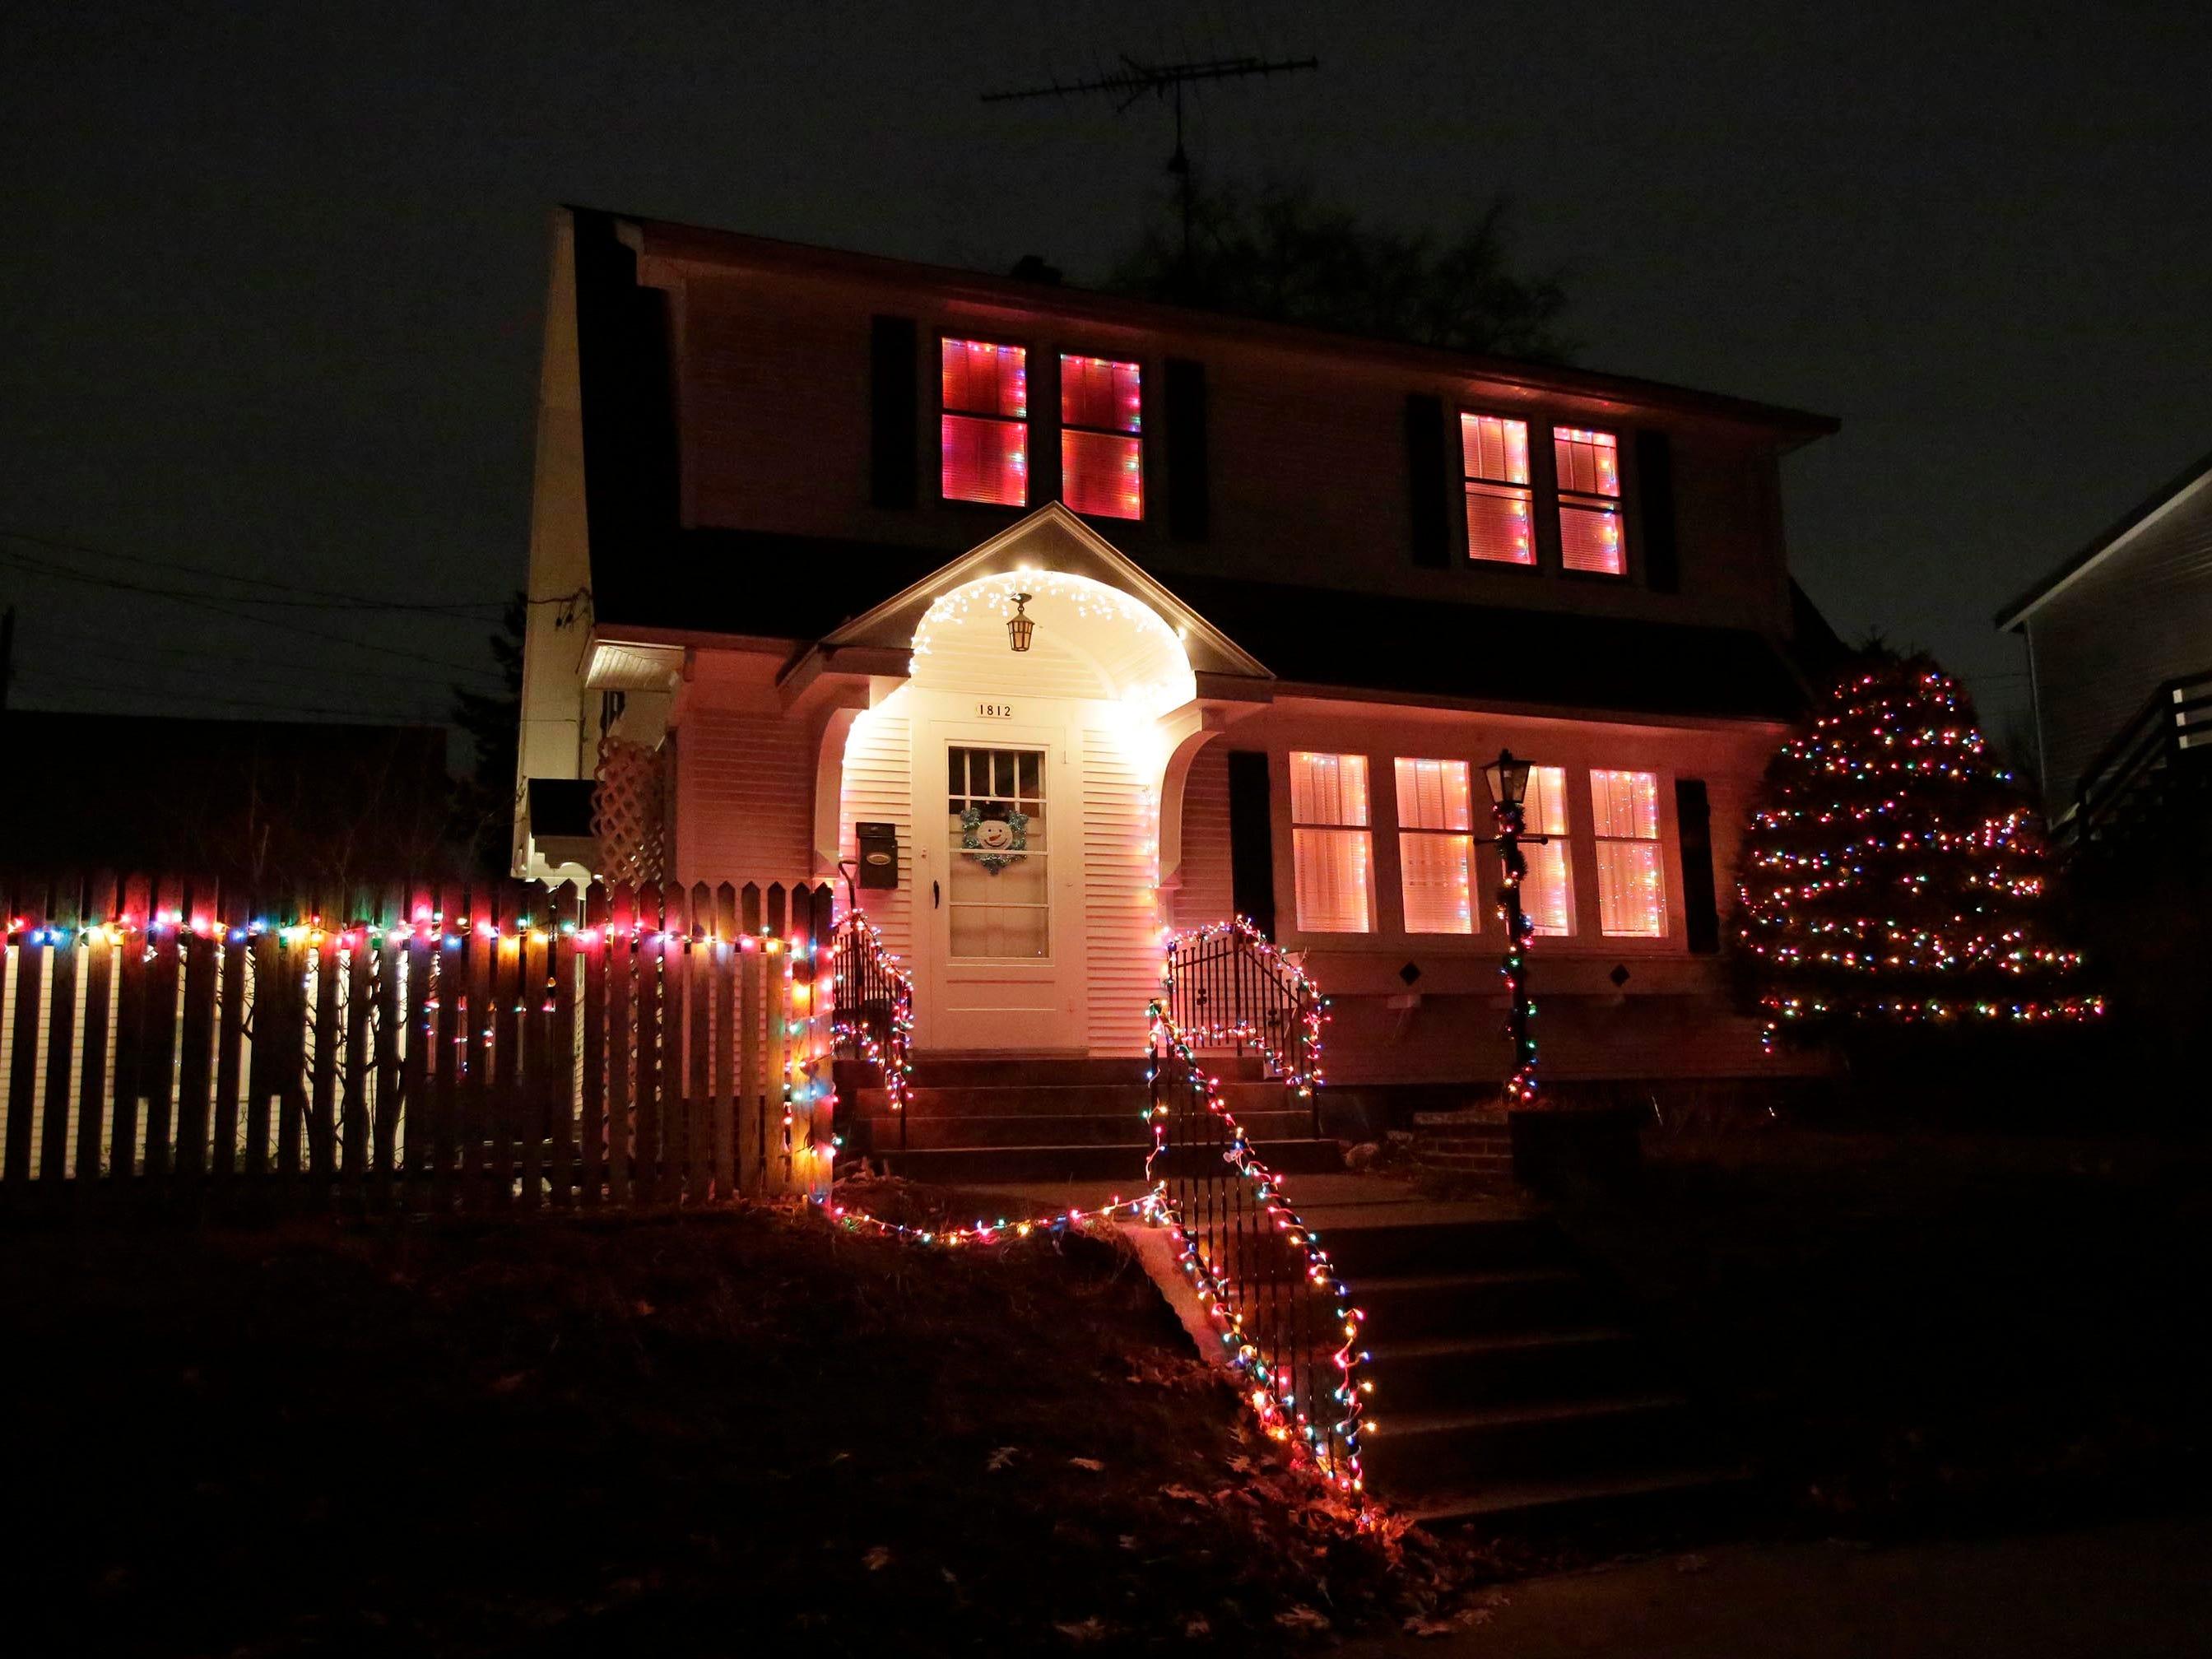 Holiday lights on S. 11th Street, Thursday, December 20, 2018, in Sheboygan, Wis.